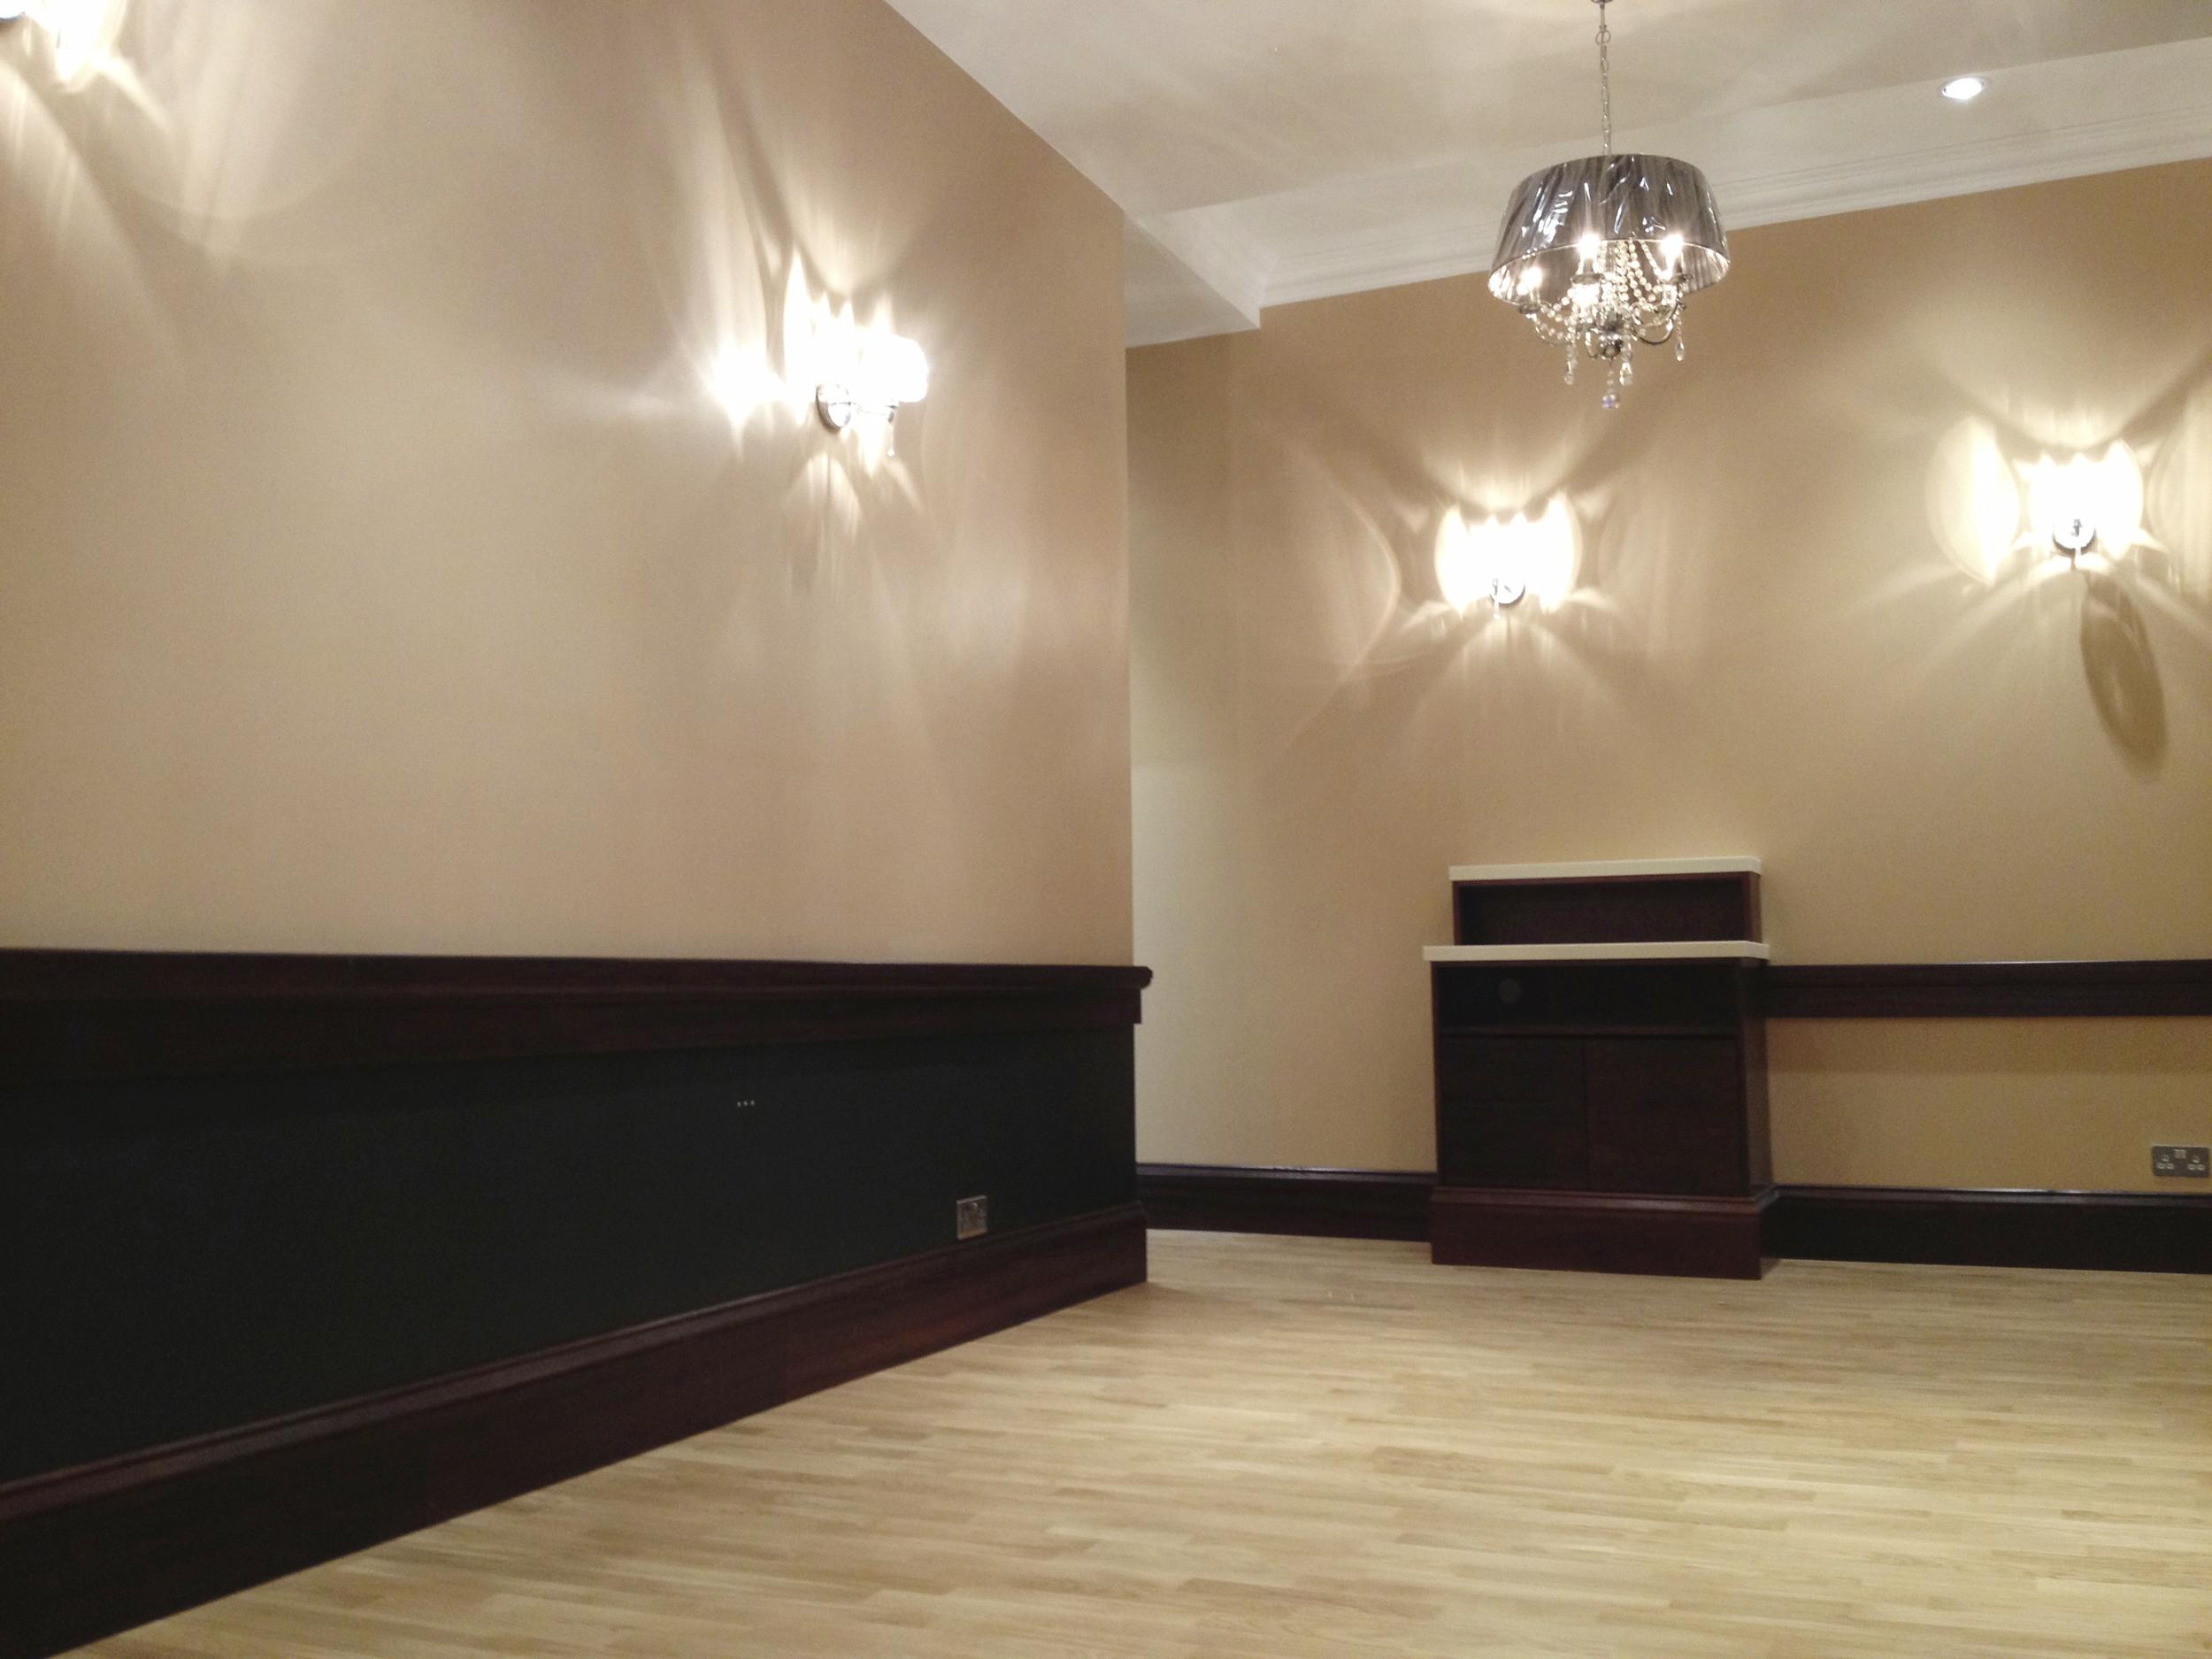 #NHRenovations #Painter #Decorator #London #Gloucester #PatisserieValerie #Shop #SeatingArea